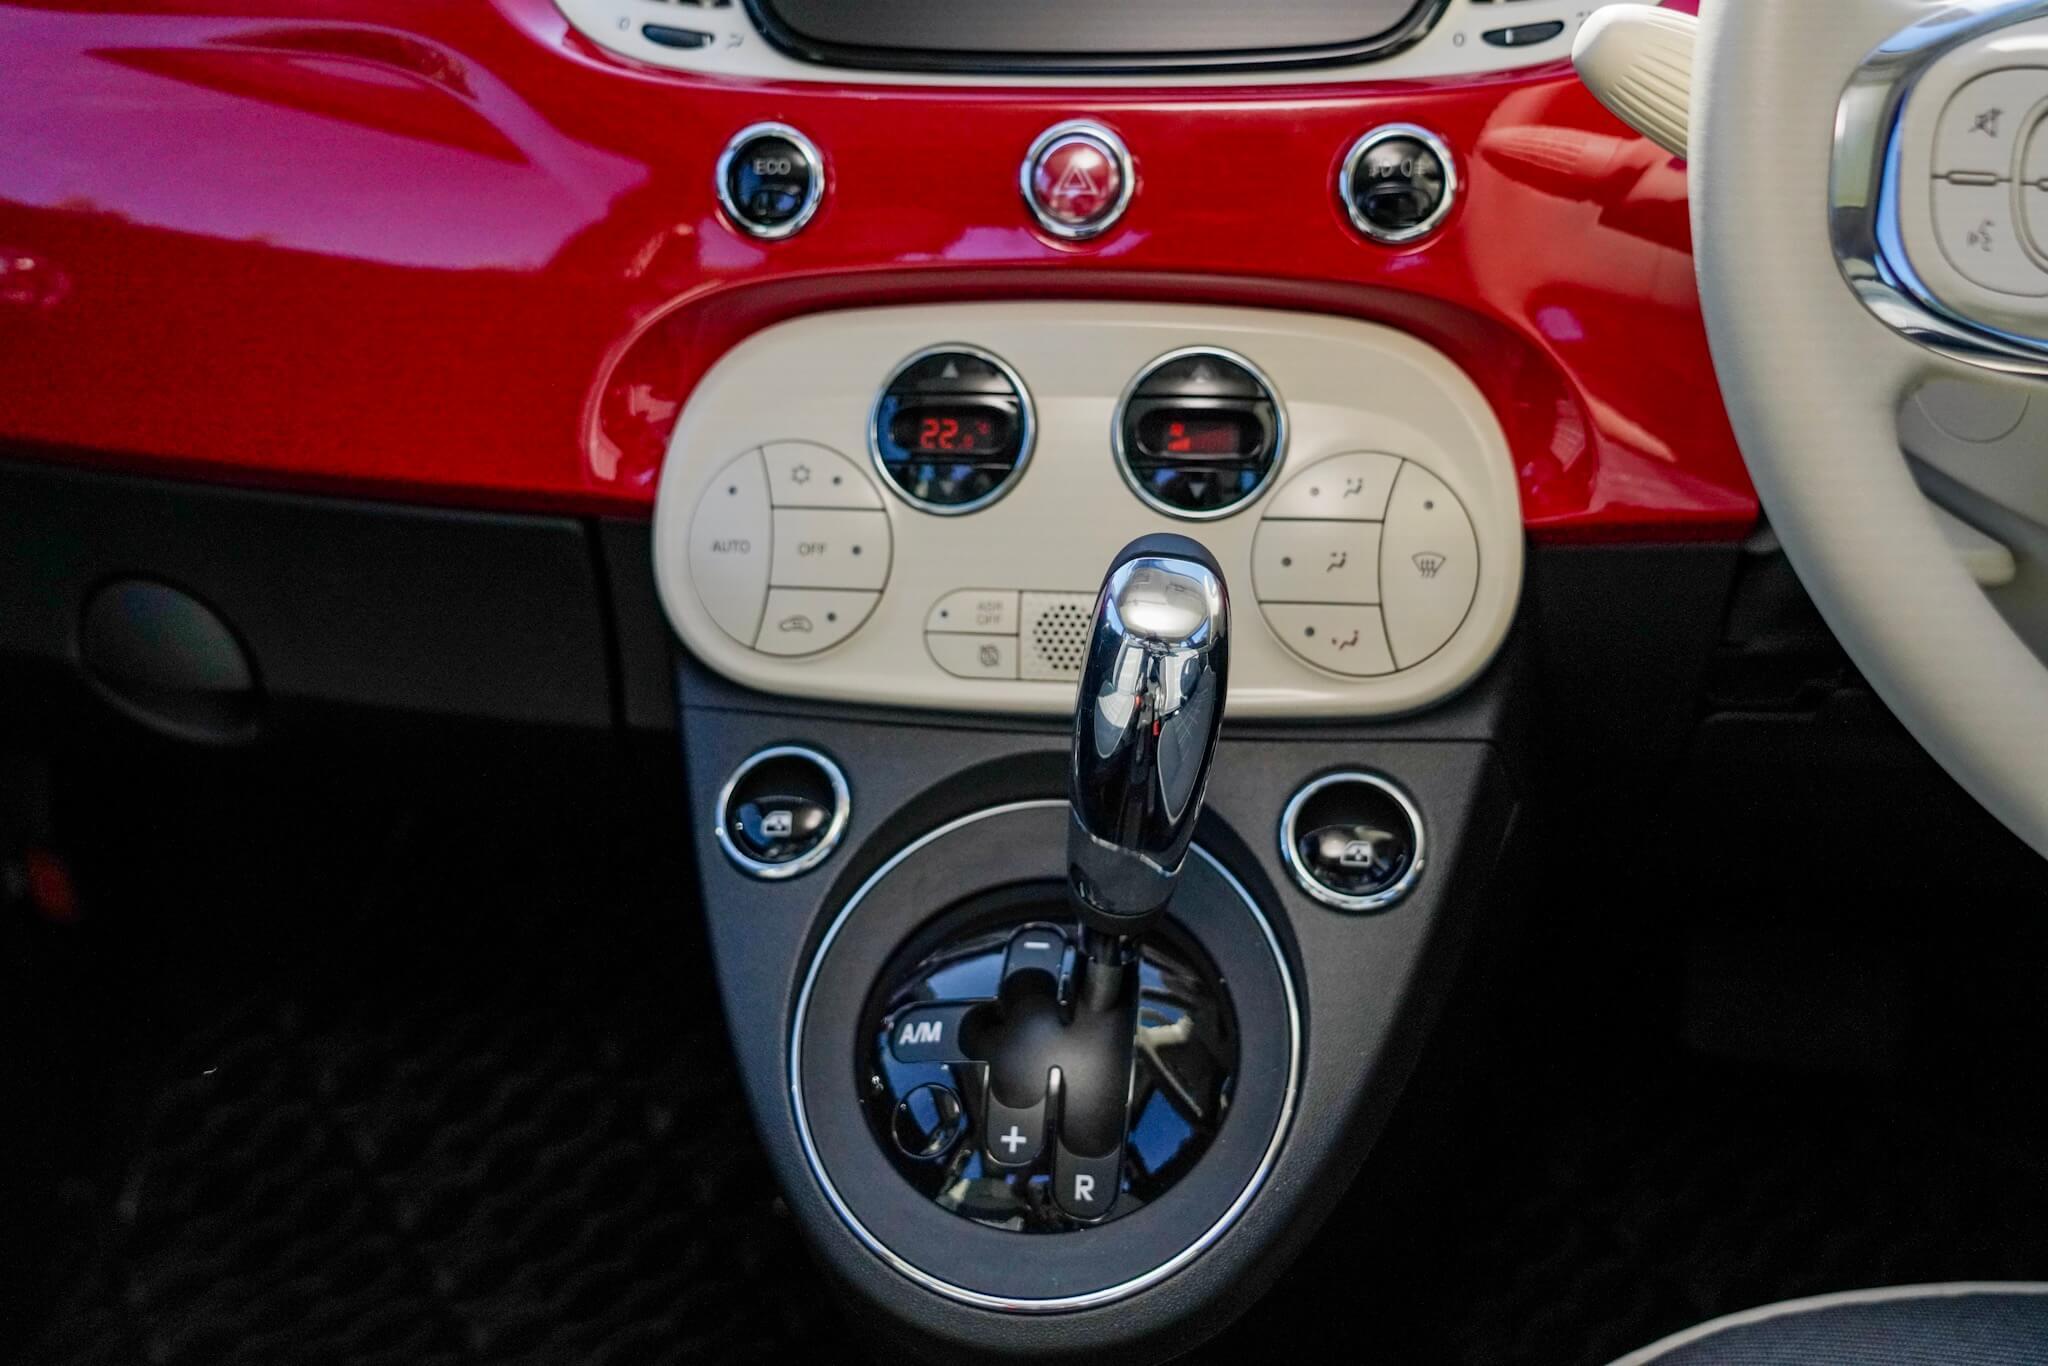 FIAT 500 ATモード付き5速シーケンシャル・トランスミッション